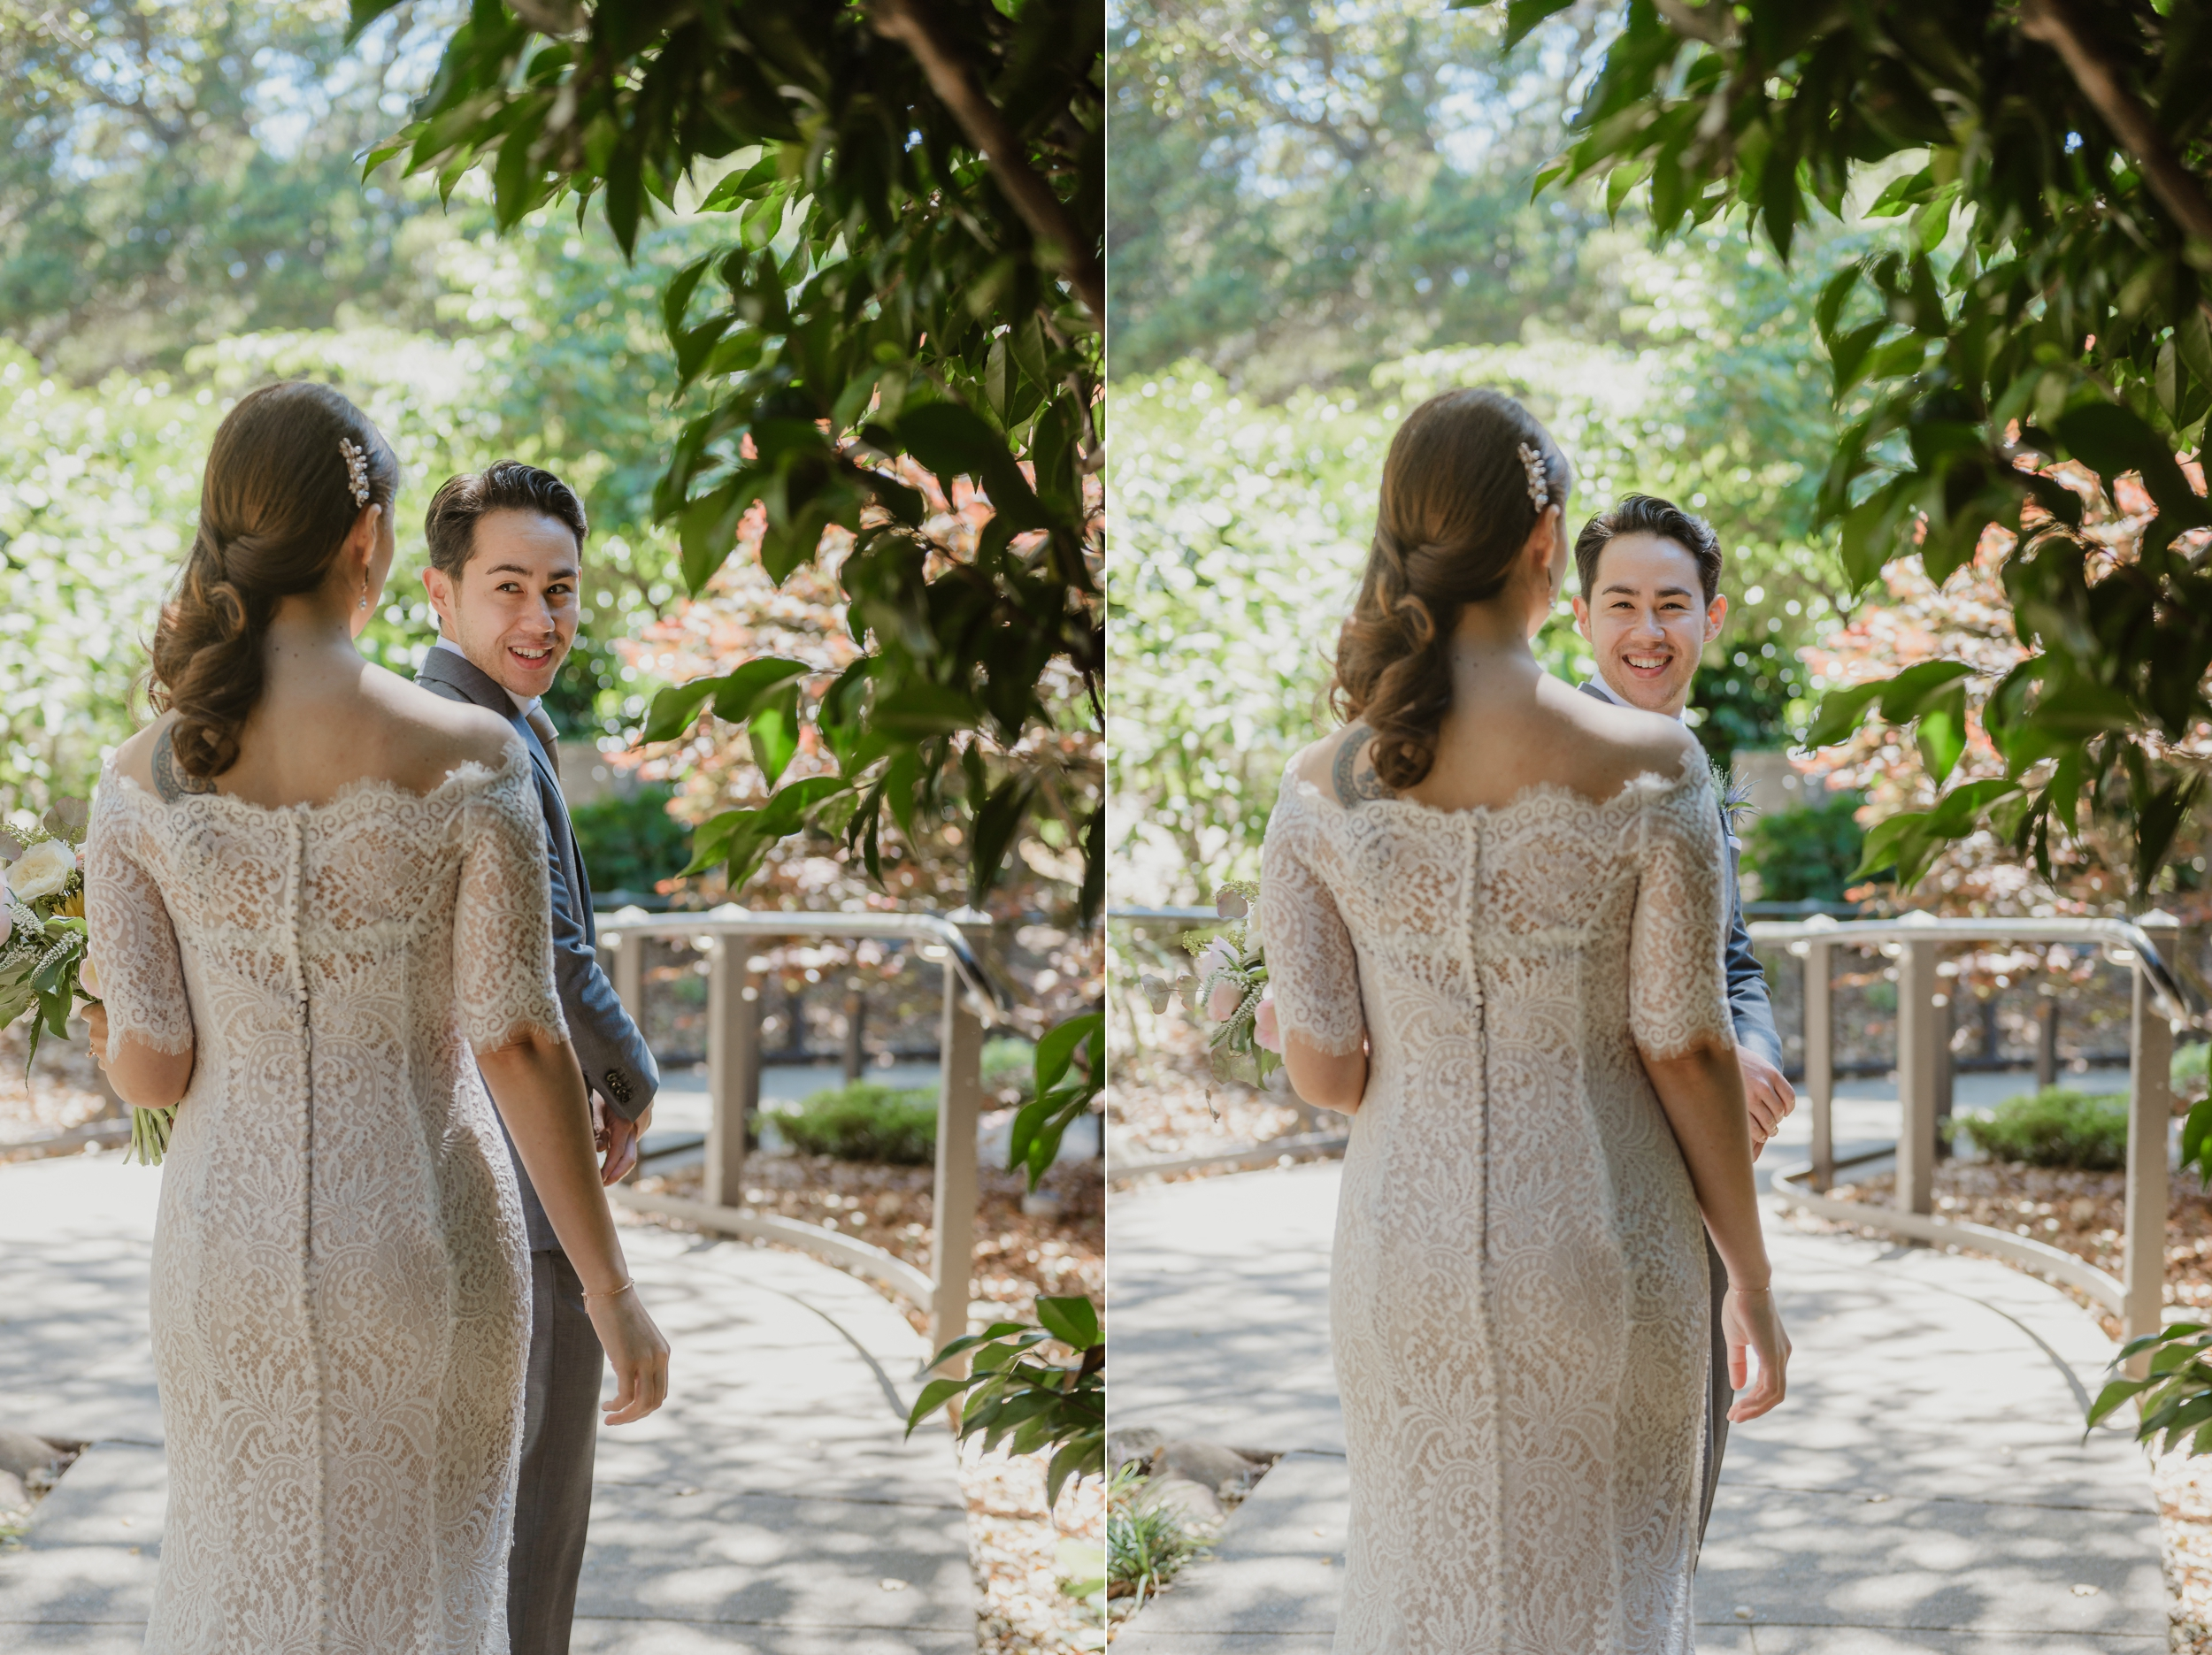 08-berkeley-uc-faculty-club-wedding-kb-vivianchen-075_WEB.jpg